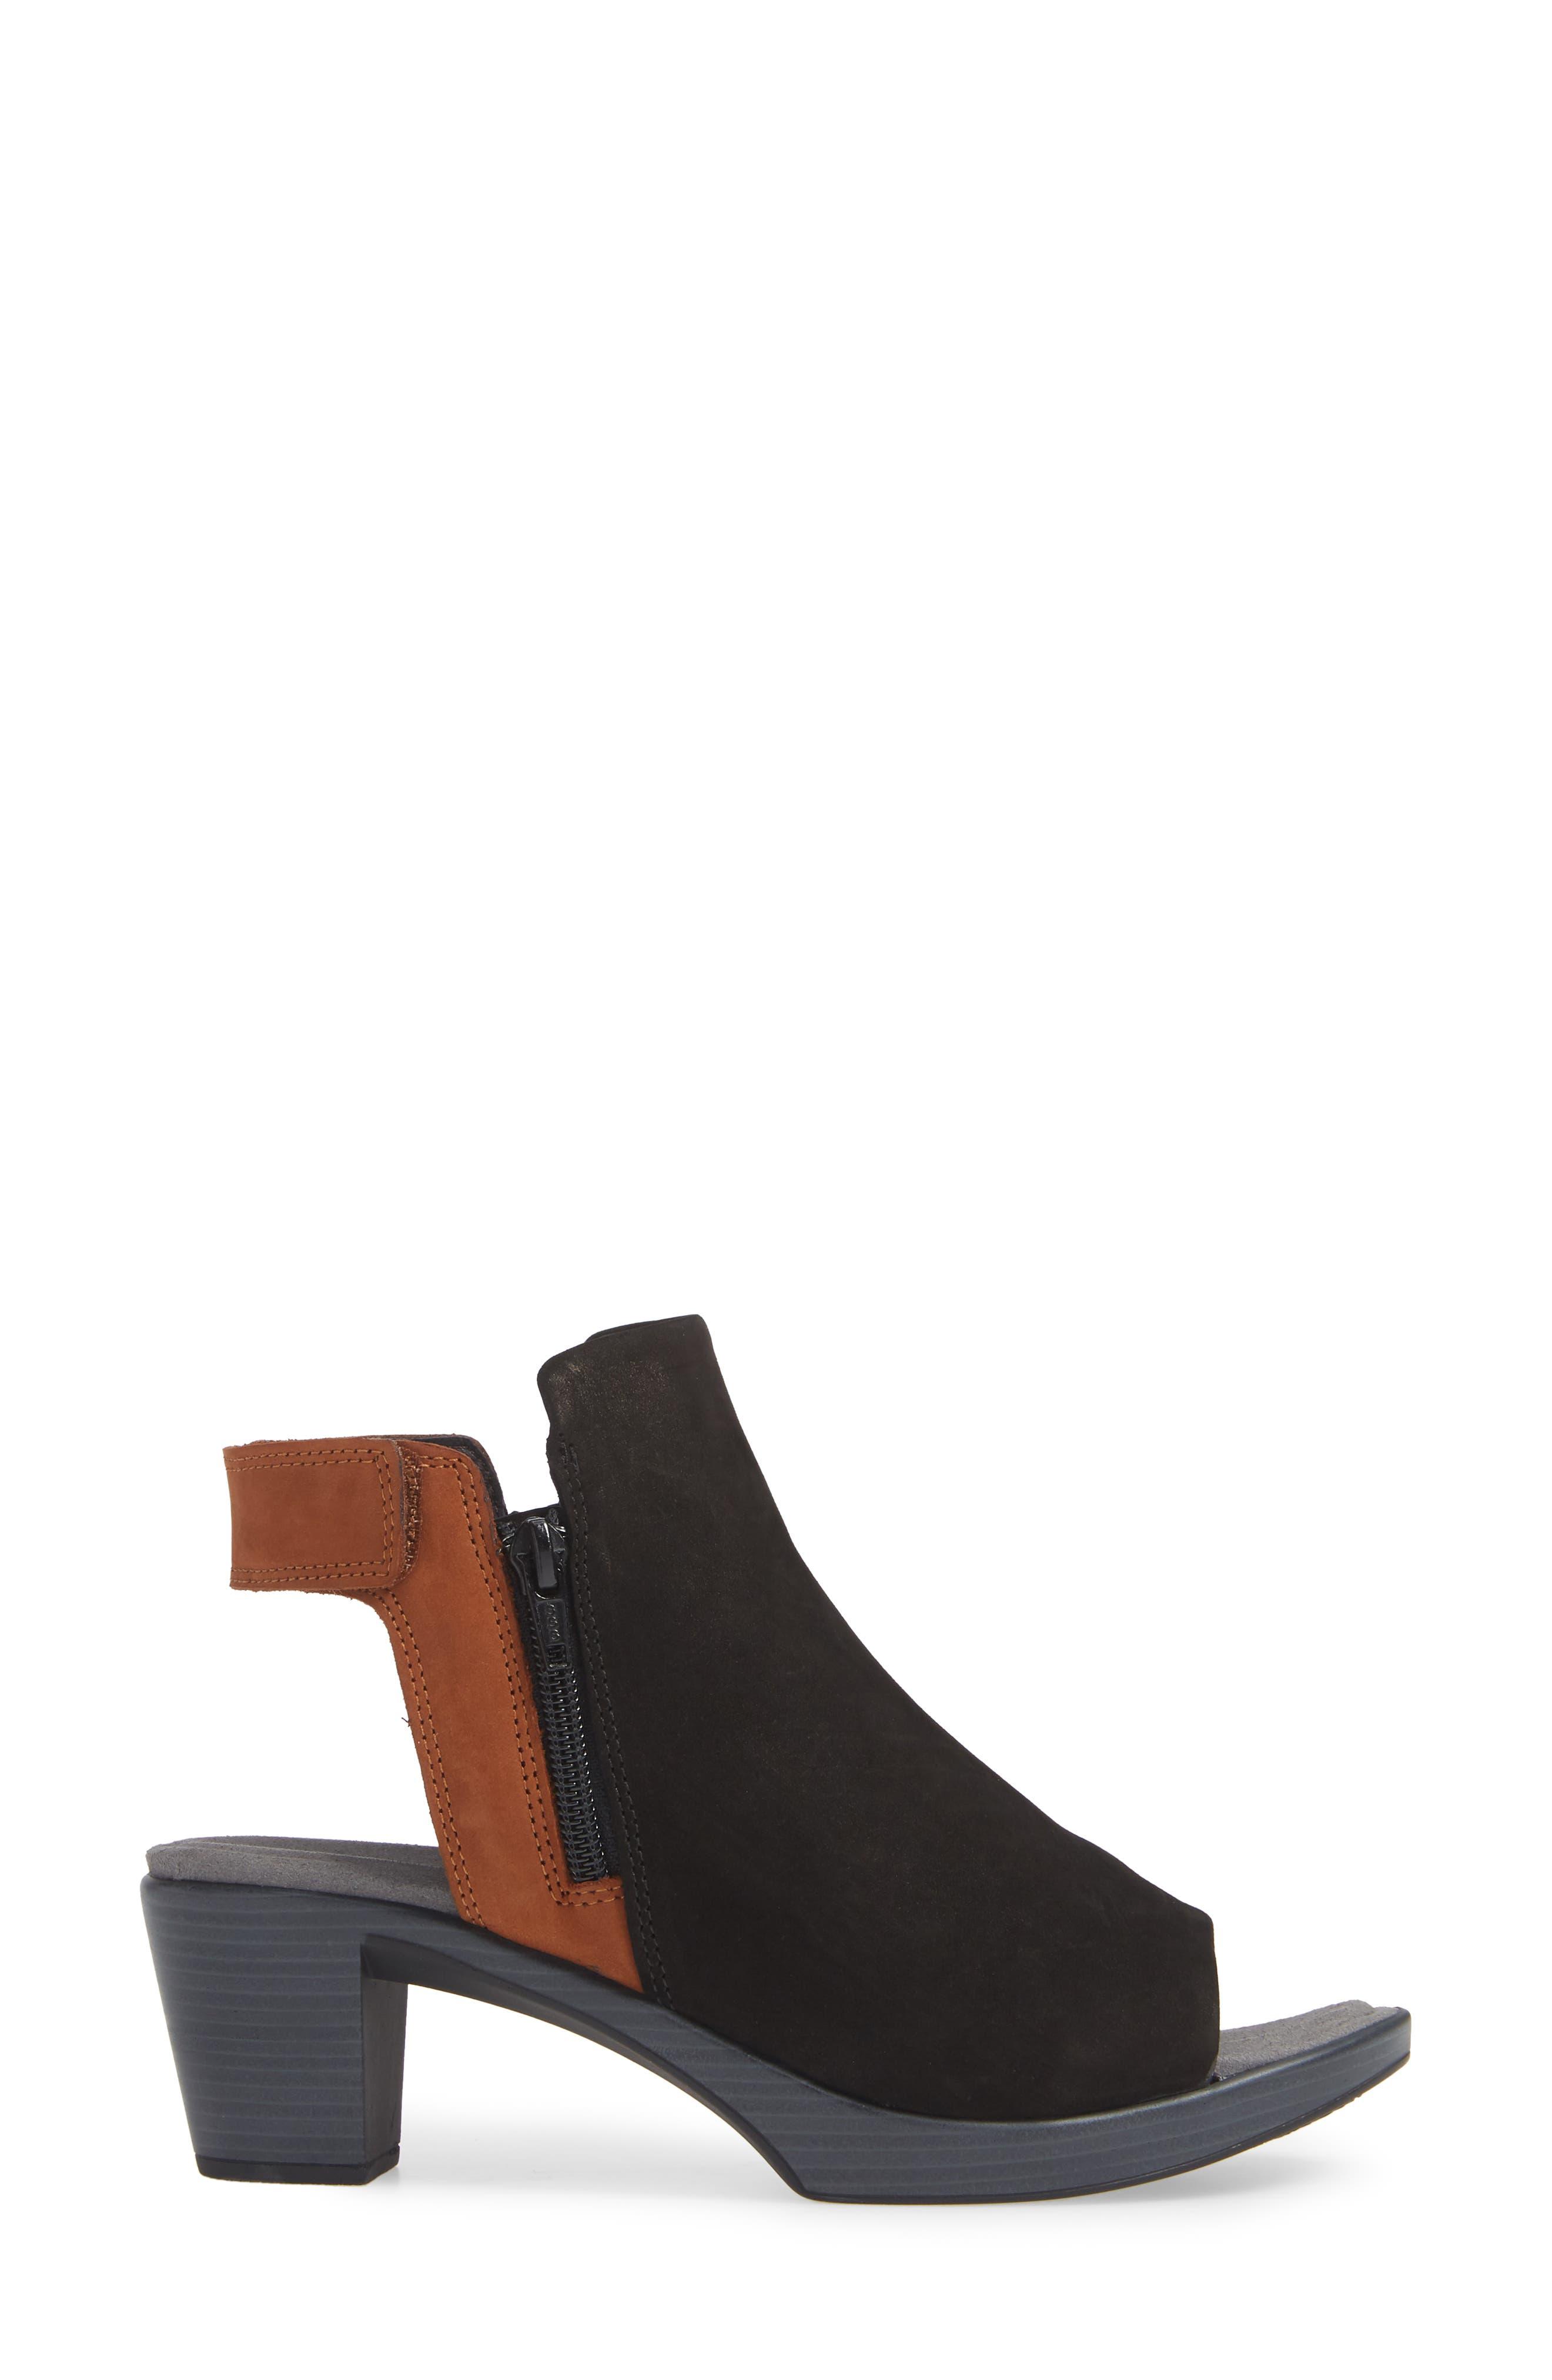 NAOT, Favorite Sandal, Alternate thumbnail 3, color, BLACK/ HAWAIIAN BROWN NUBUCK